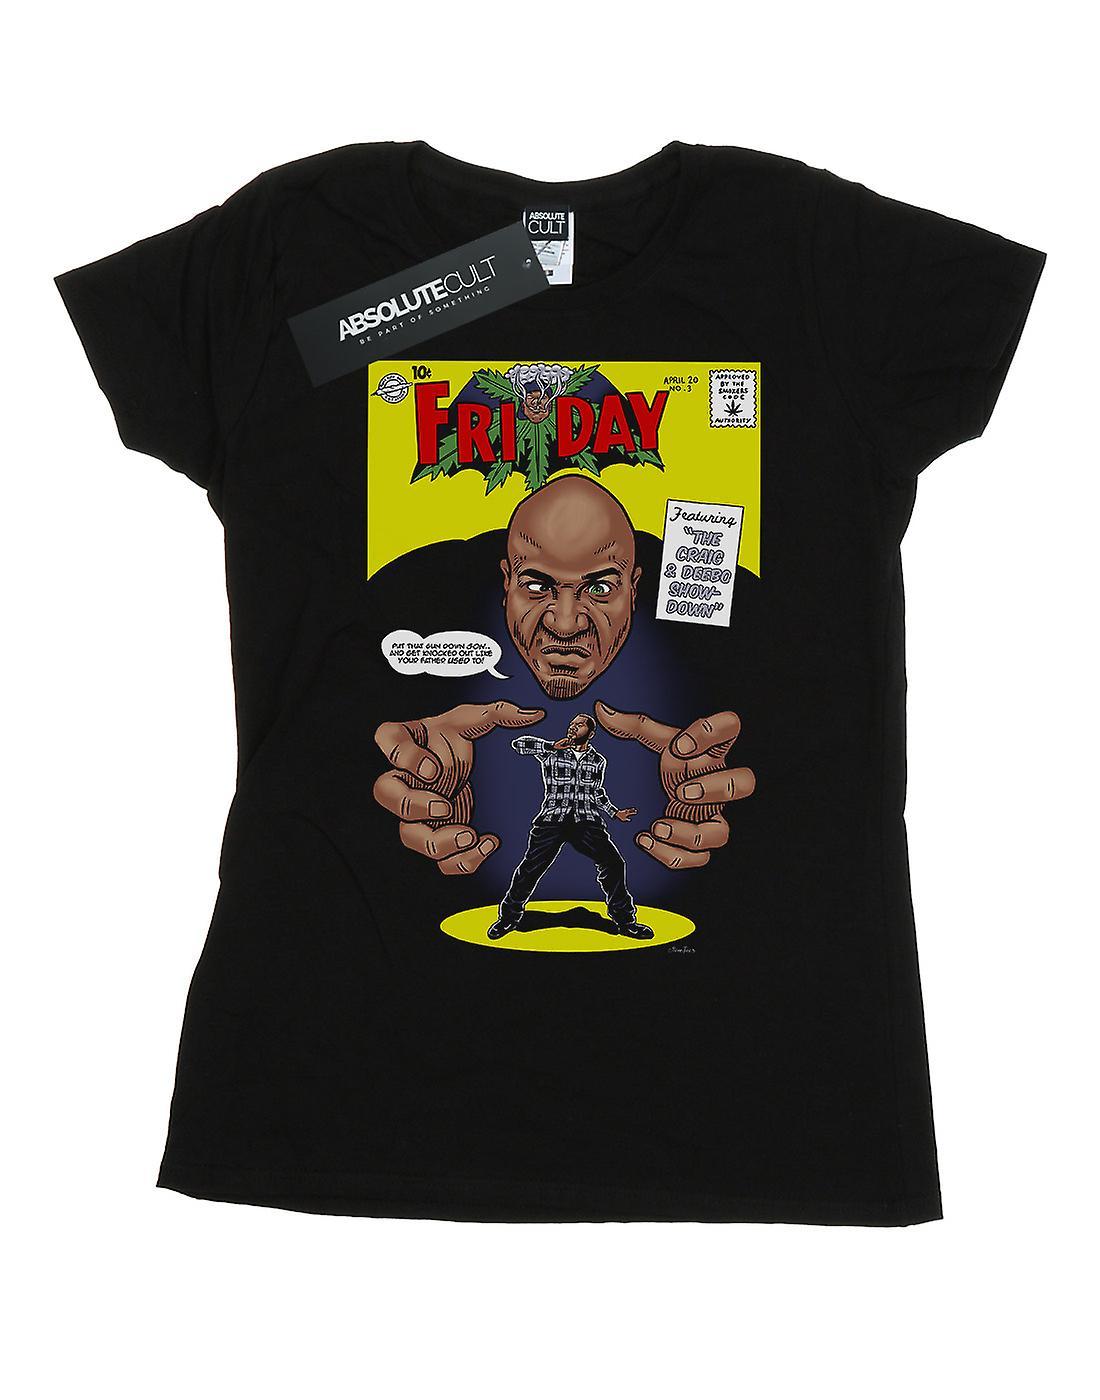 Pennytees Women's Friday Comic T-Shirt